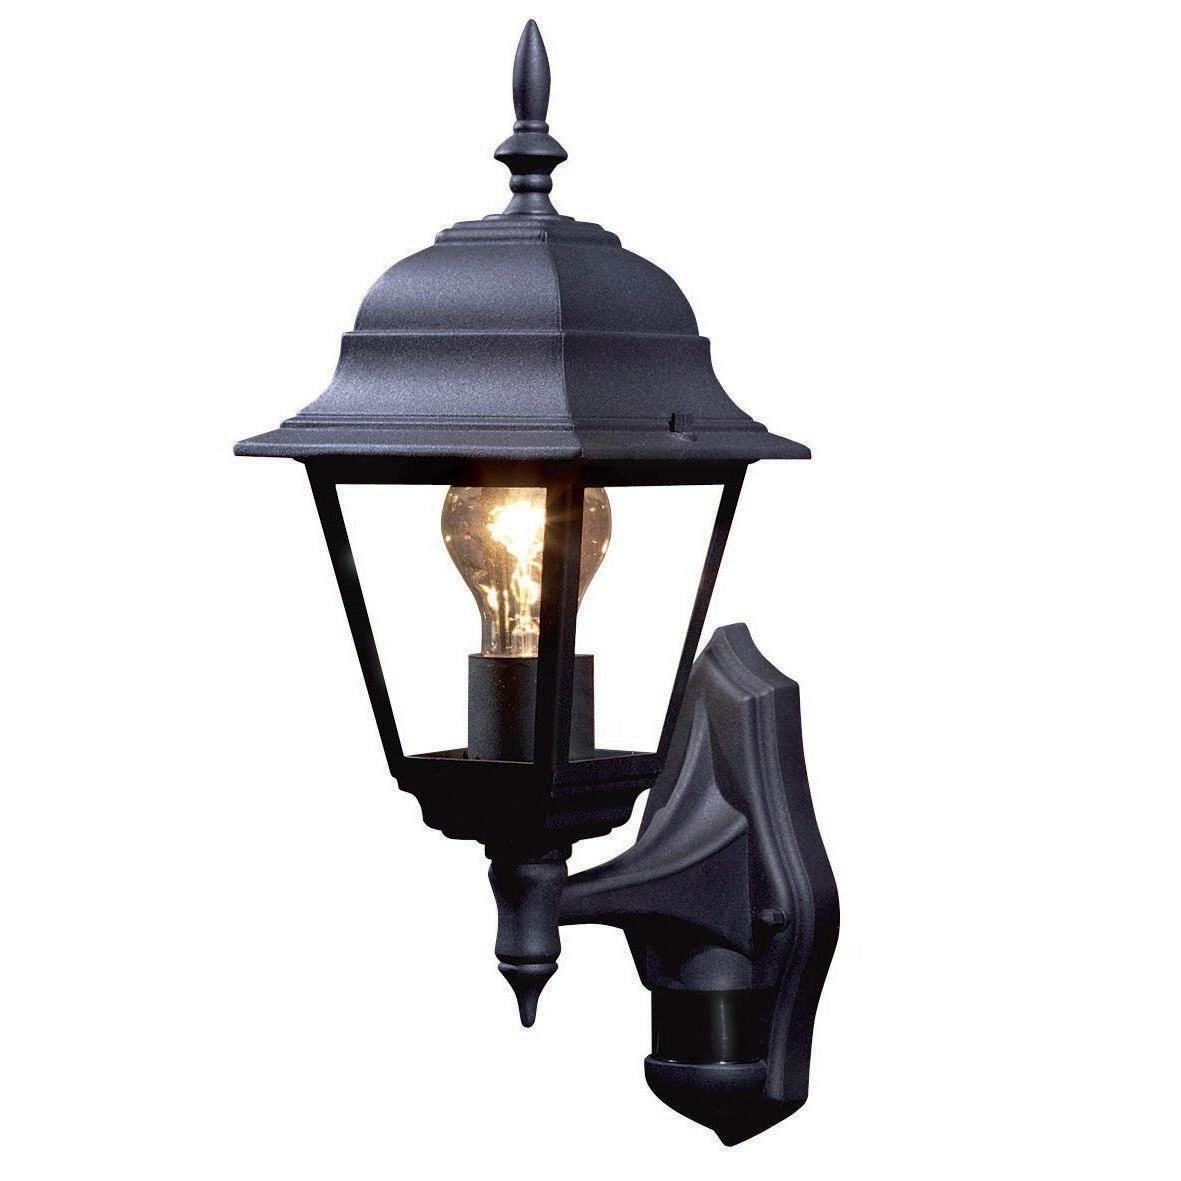 Current Polperro Black 60W Mains Powered External Pir Lantern (Gallery 2 of 20)